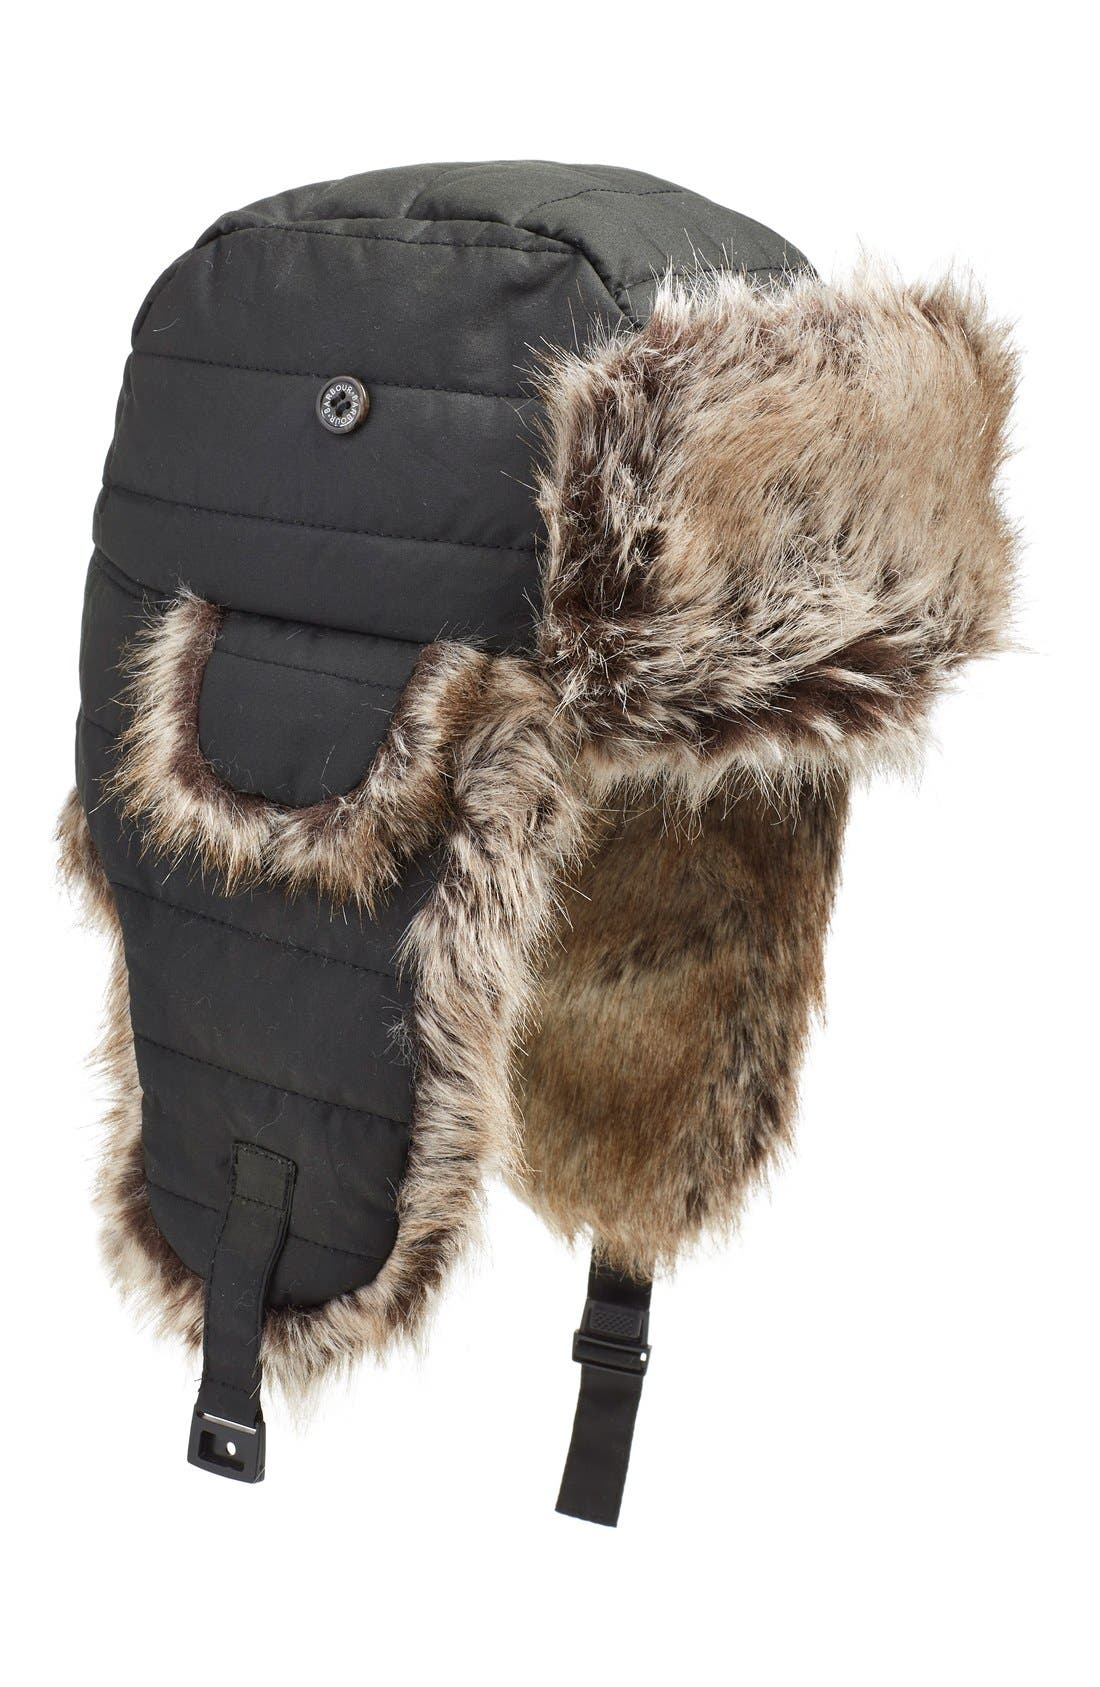 Alternate Image 1 Selected - Barbour 'Adams' Faux Fur Trapper Hat